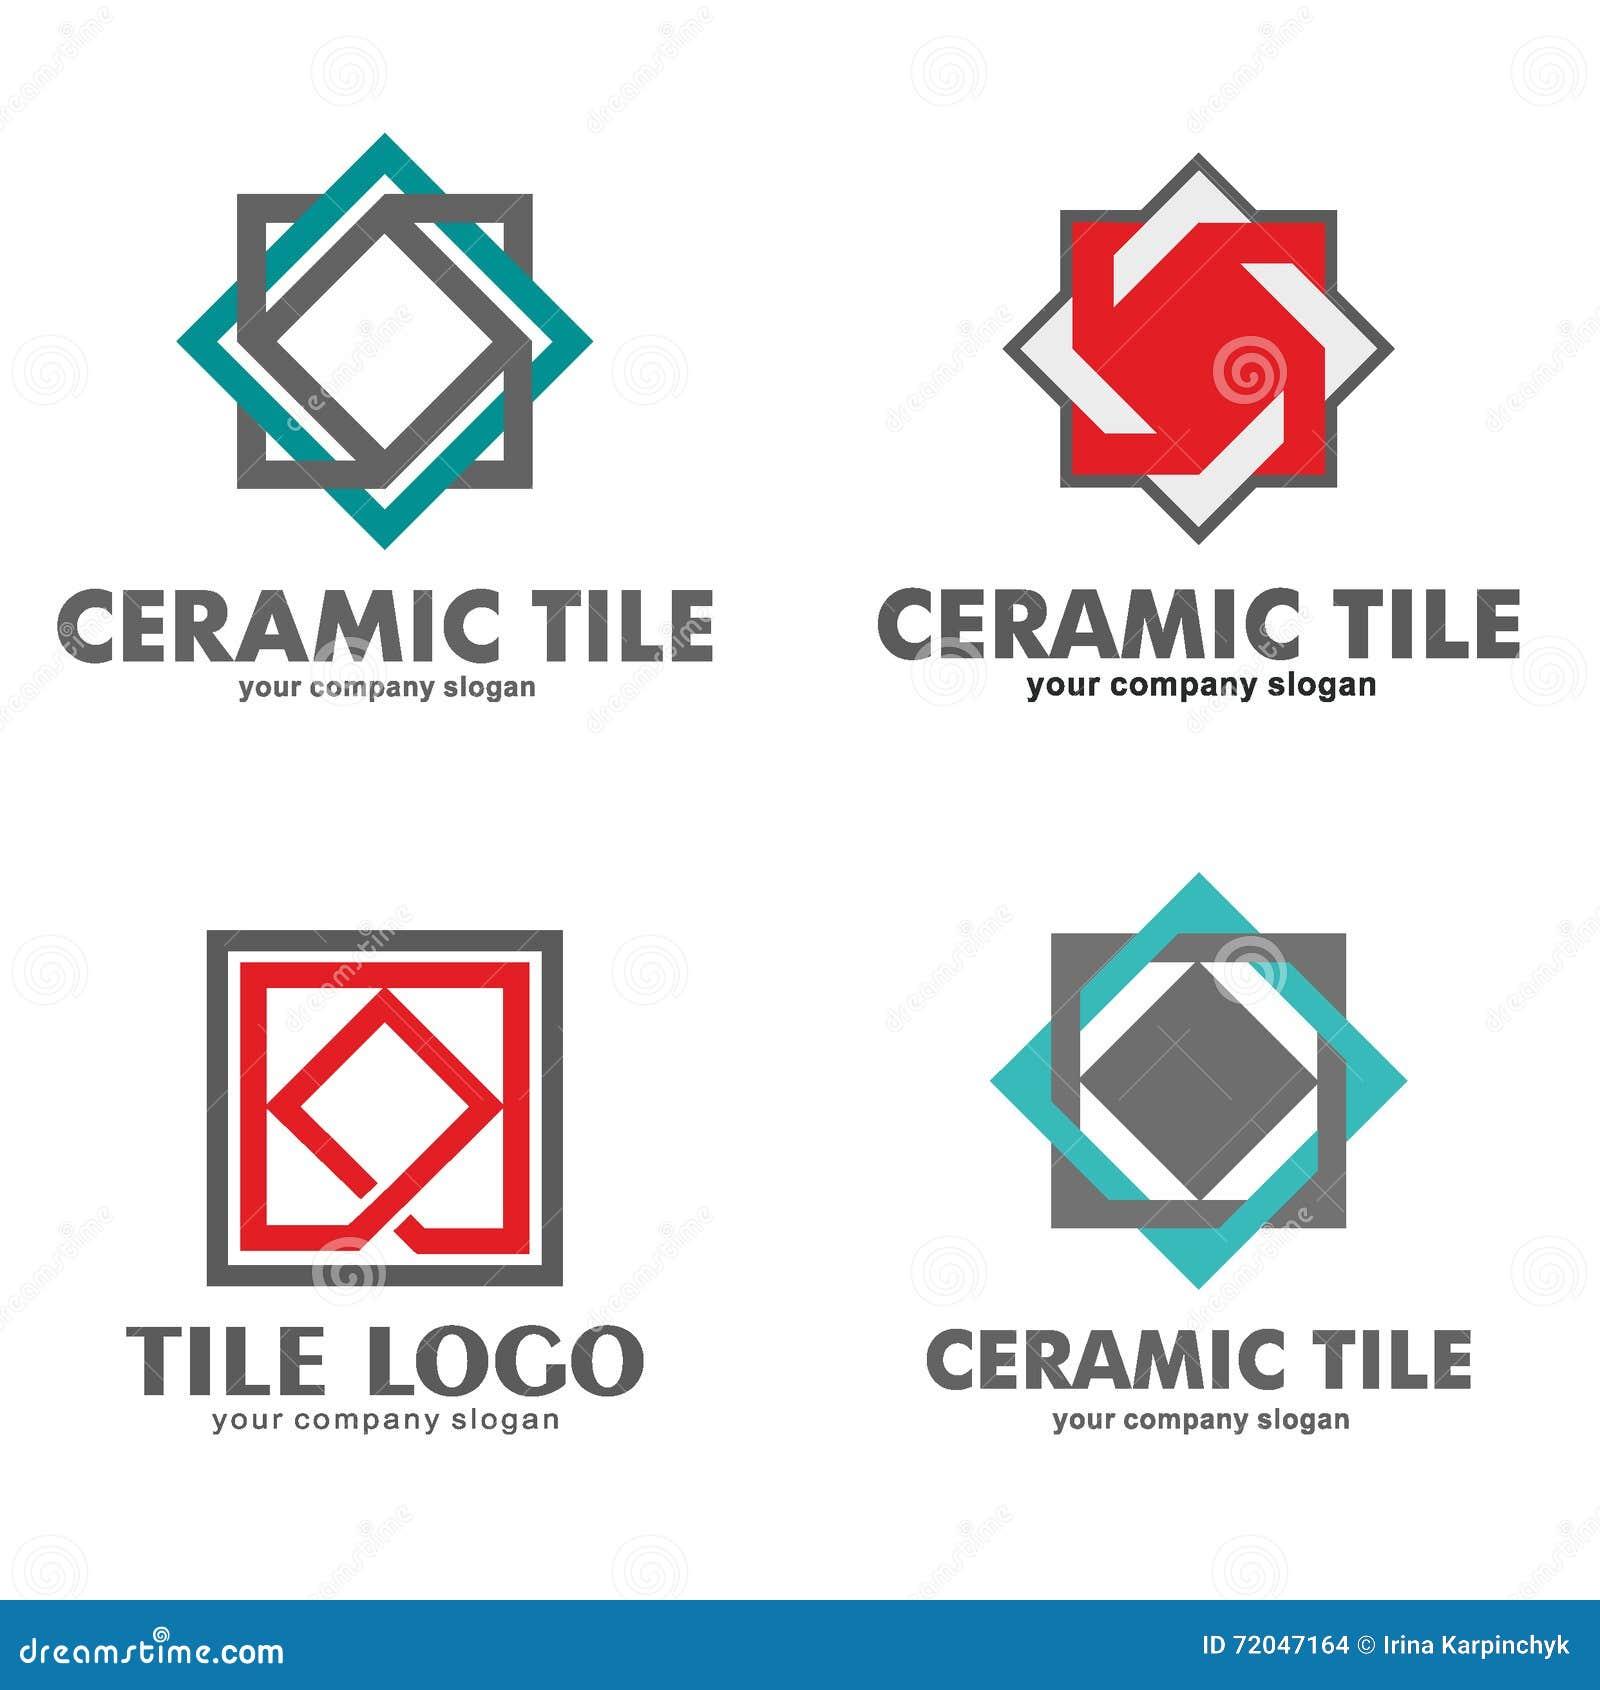 Covering tiles in bathroom - Set Of Logos Of Ceramic Tiles Vector Illustration Stock